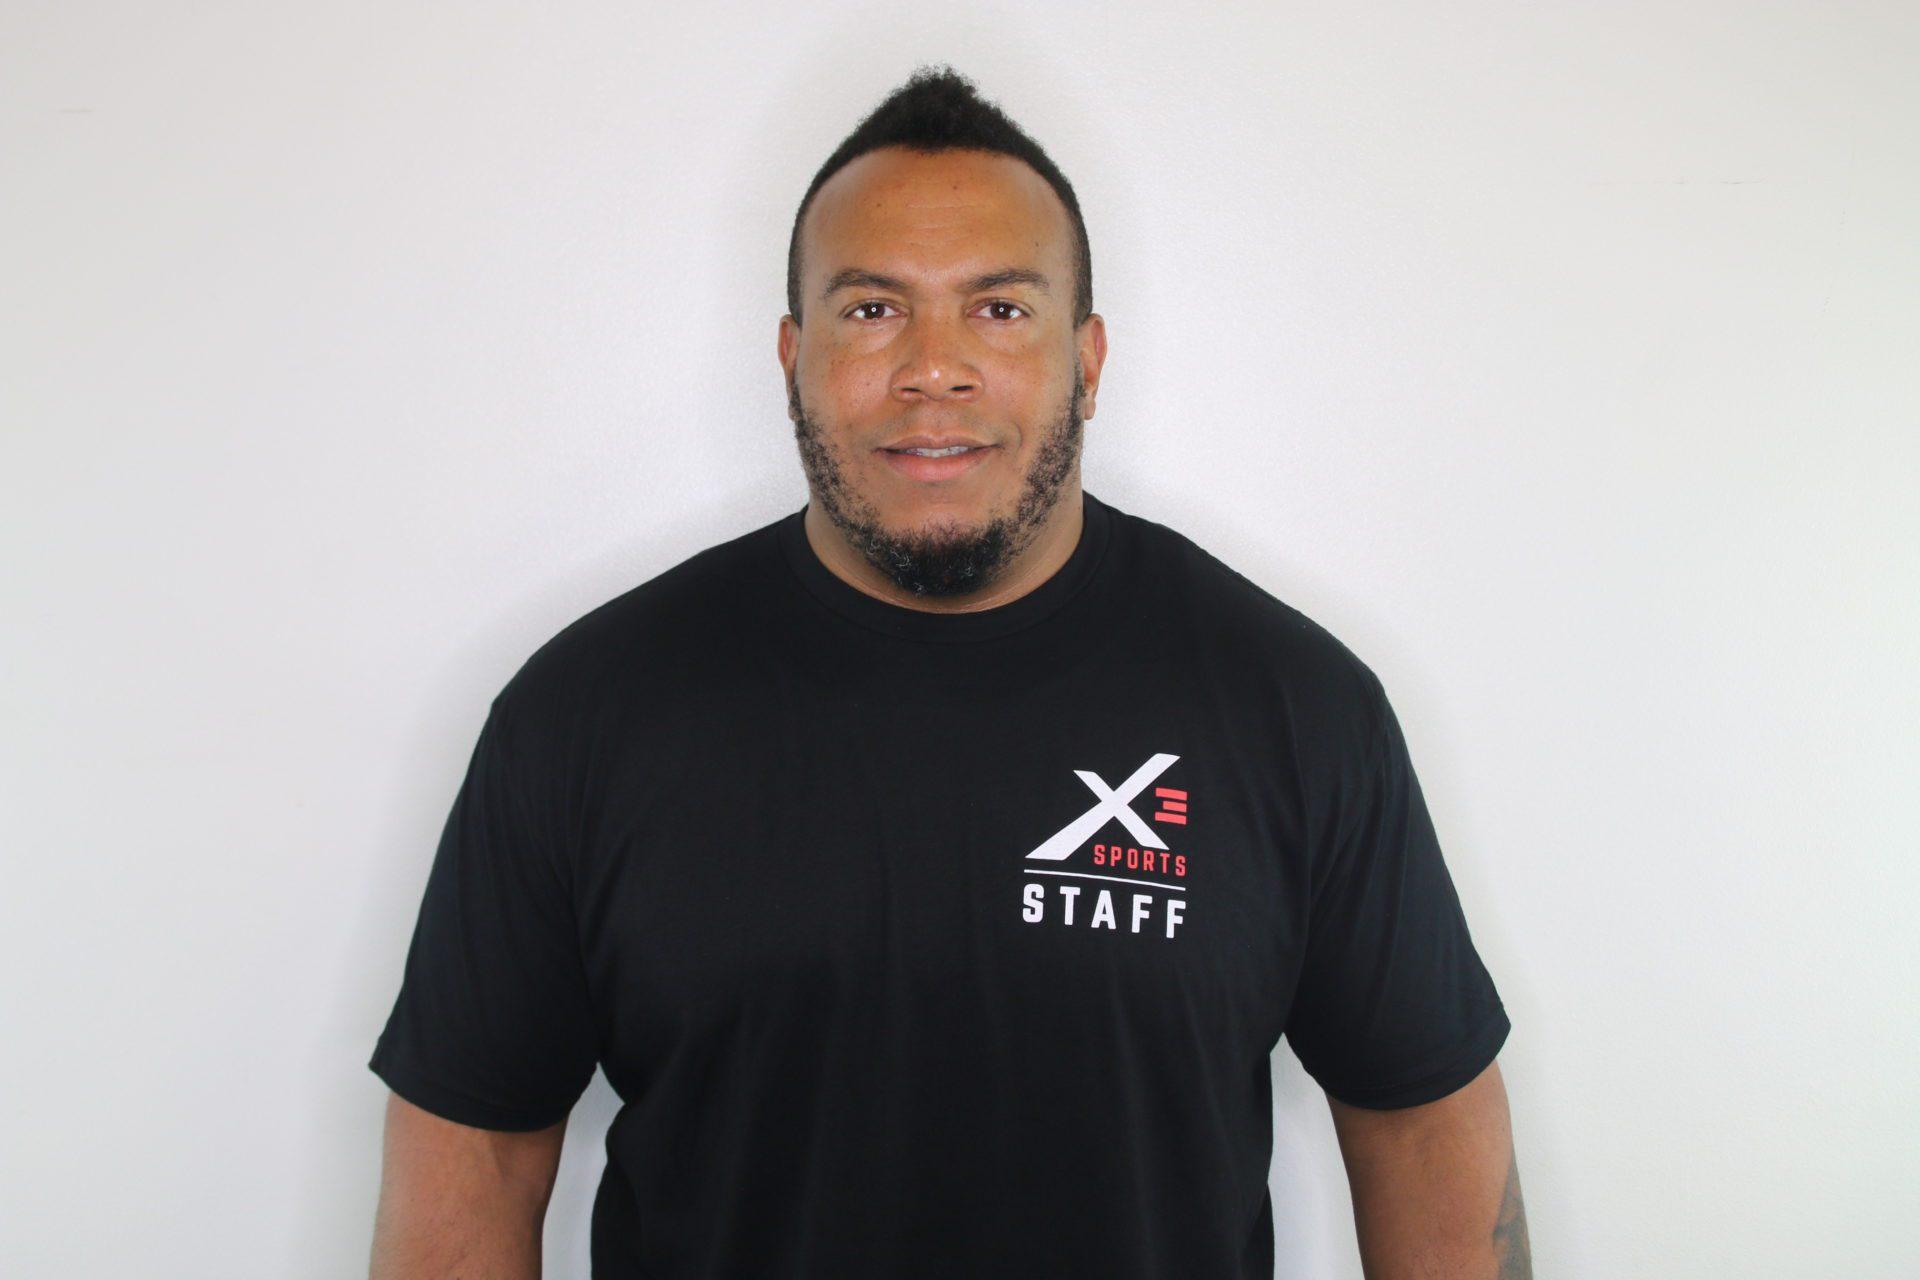 Shawn Hunter | X3 Sports Employee | X3 Sports